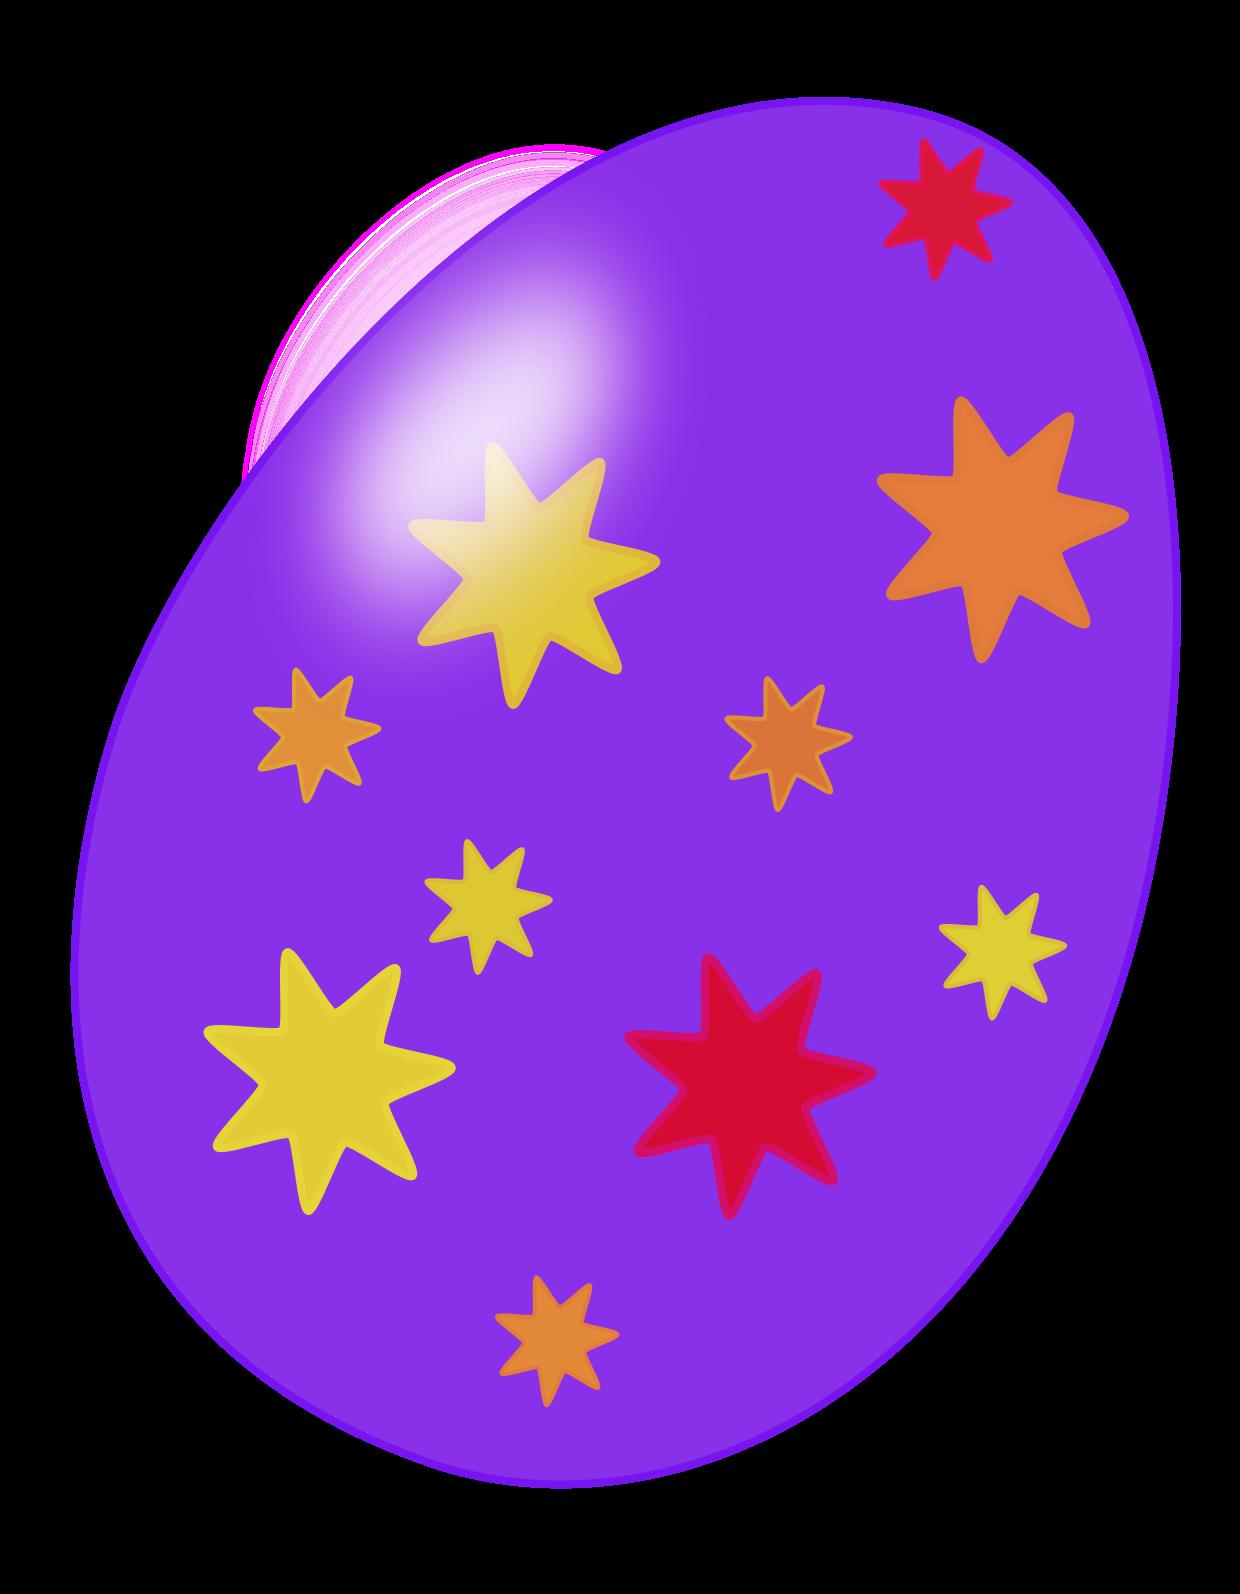 Easter egg corner clipart clip library download EASTER EGG | CLIP ART - EASTER - CLIPART | Pinterest | Easter, Egg ... clip library download